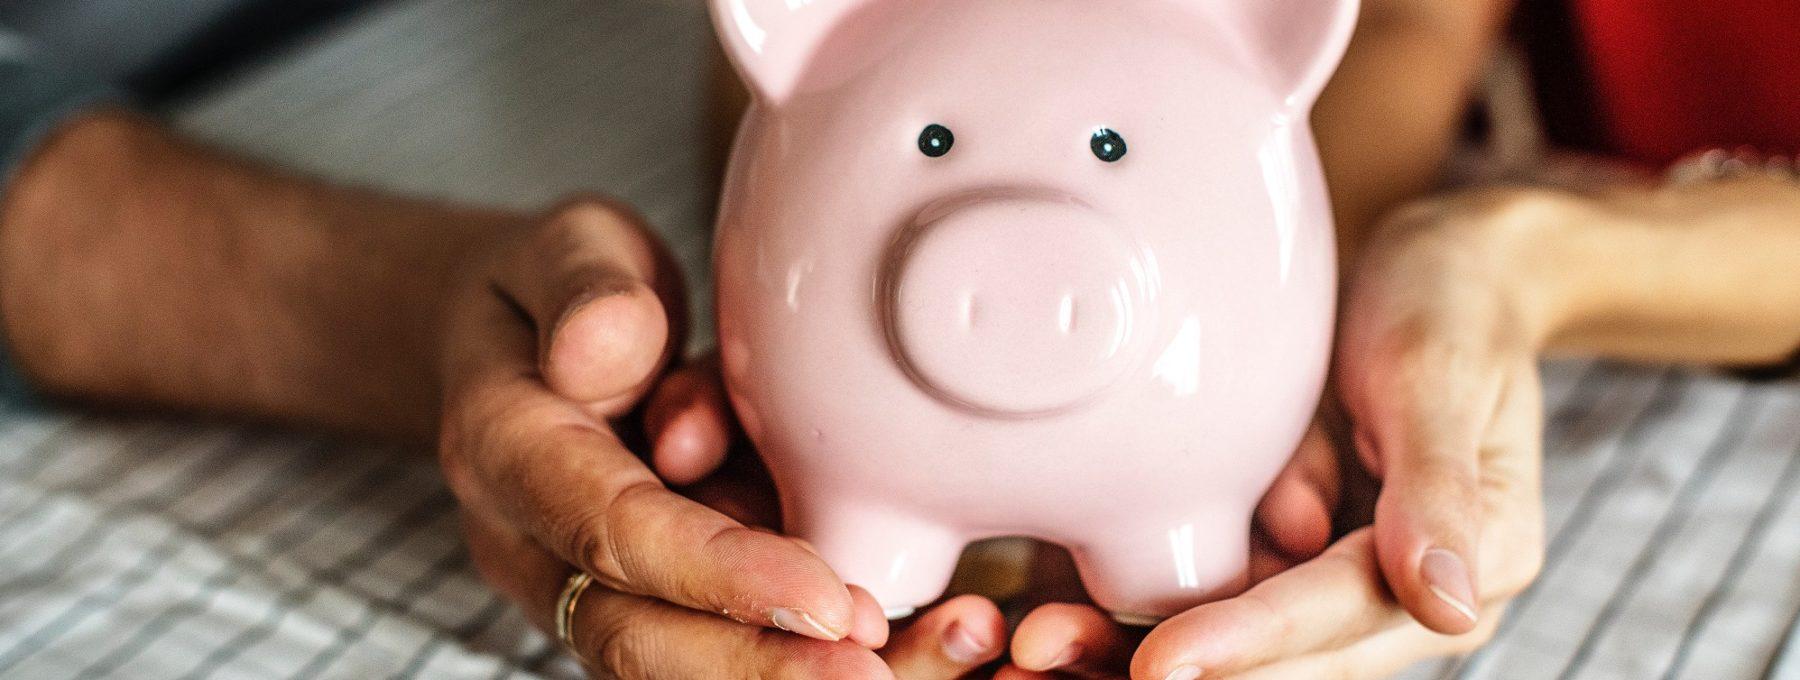 Making Saving Money During The Summer Holidays Usa